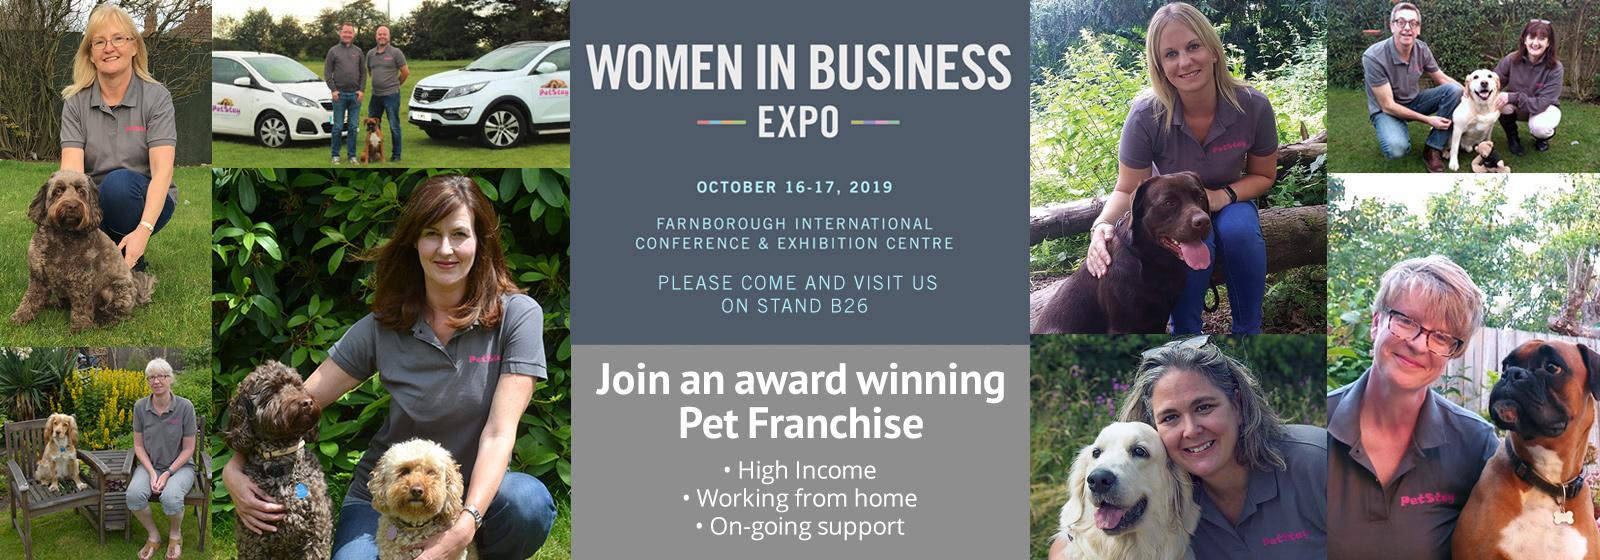 Women in Business Expo 2019